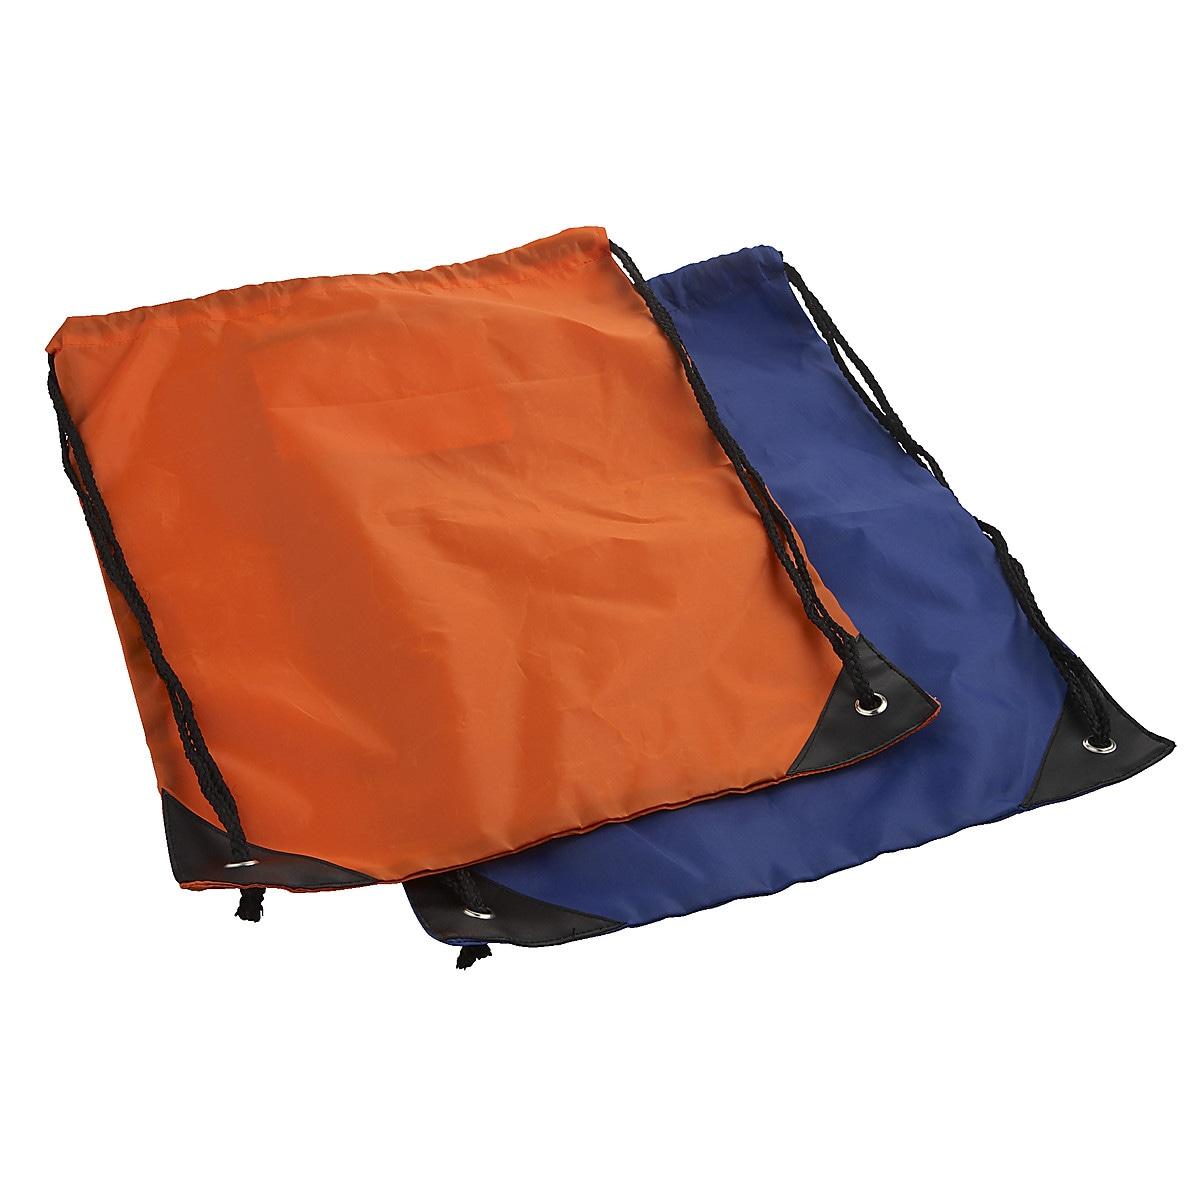 Tøypose, Asaklitt